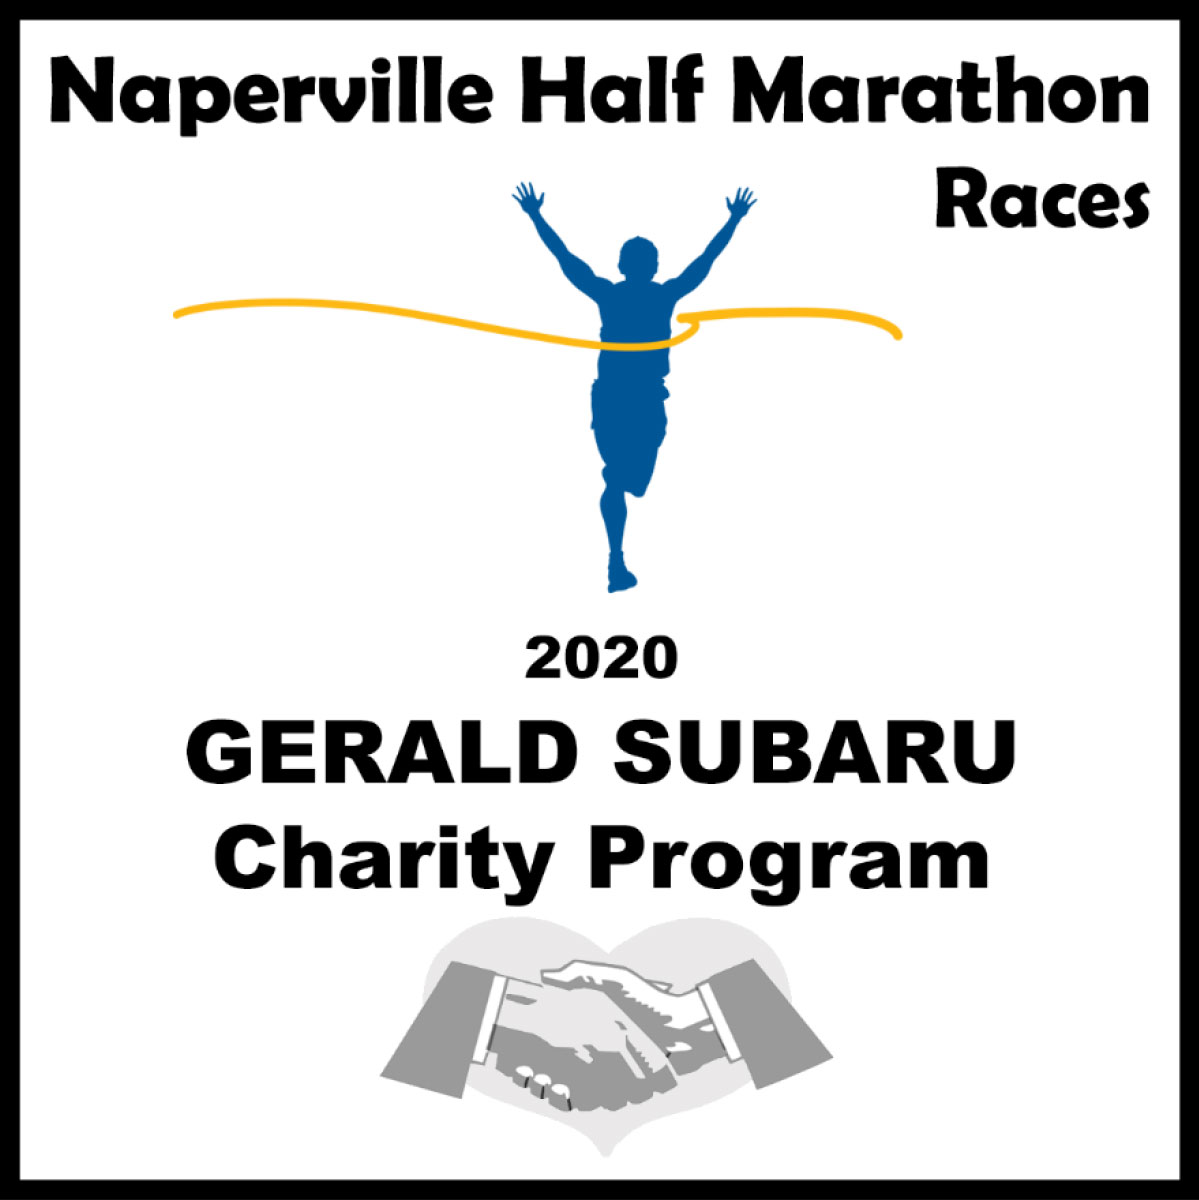 Naperville Half Marathon Races